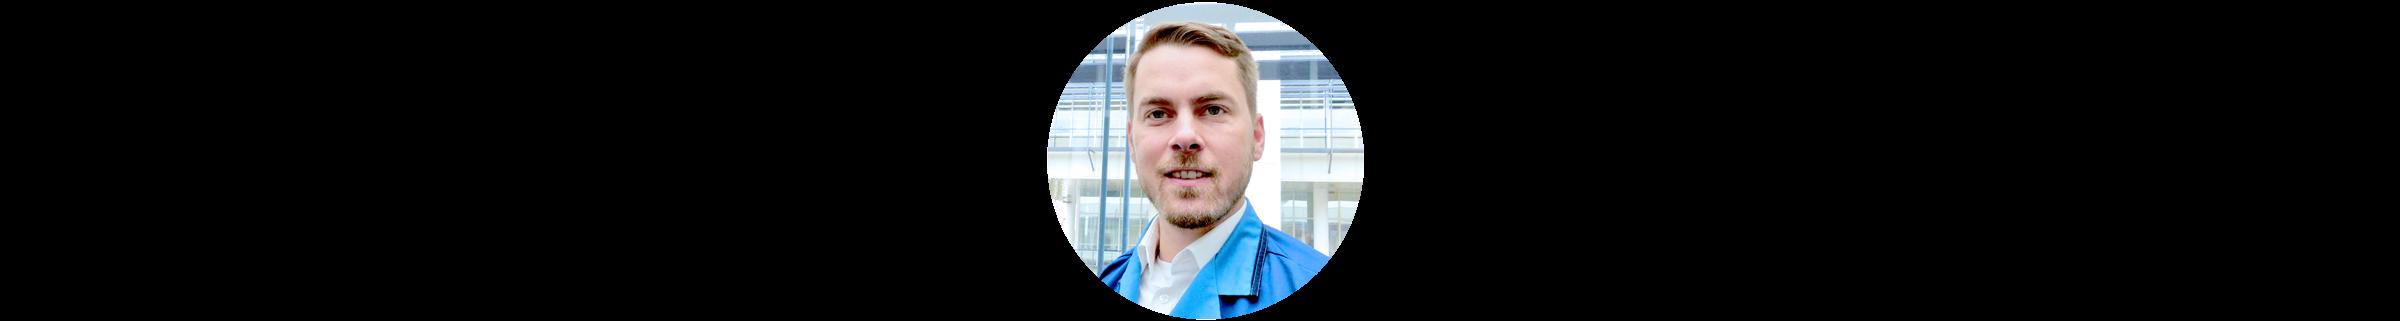 BMW Josef Pilstl Website